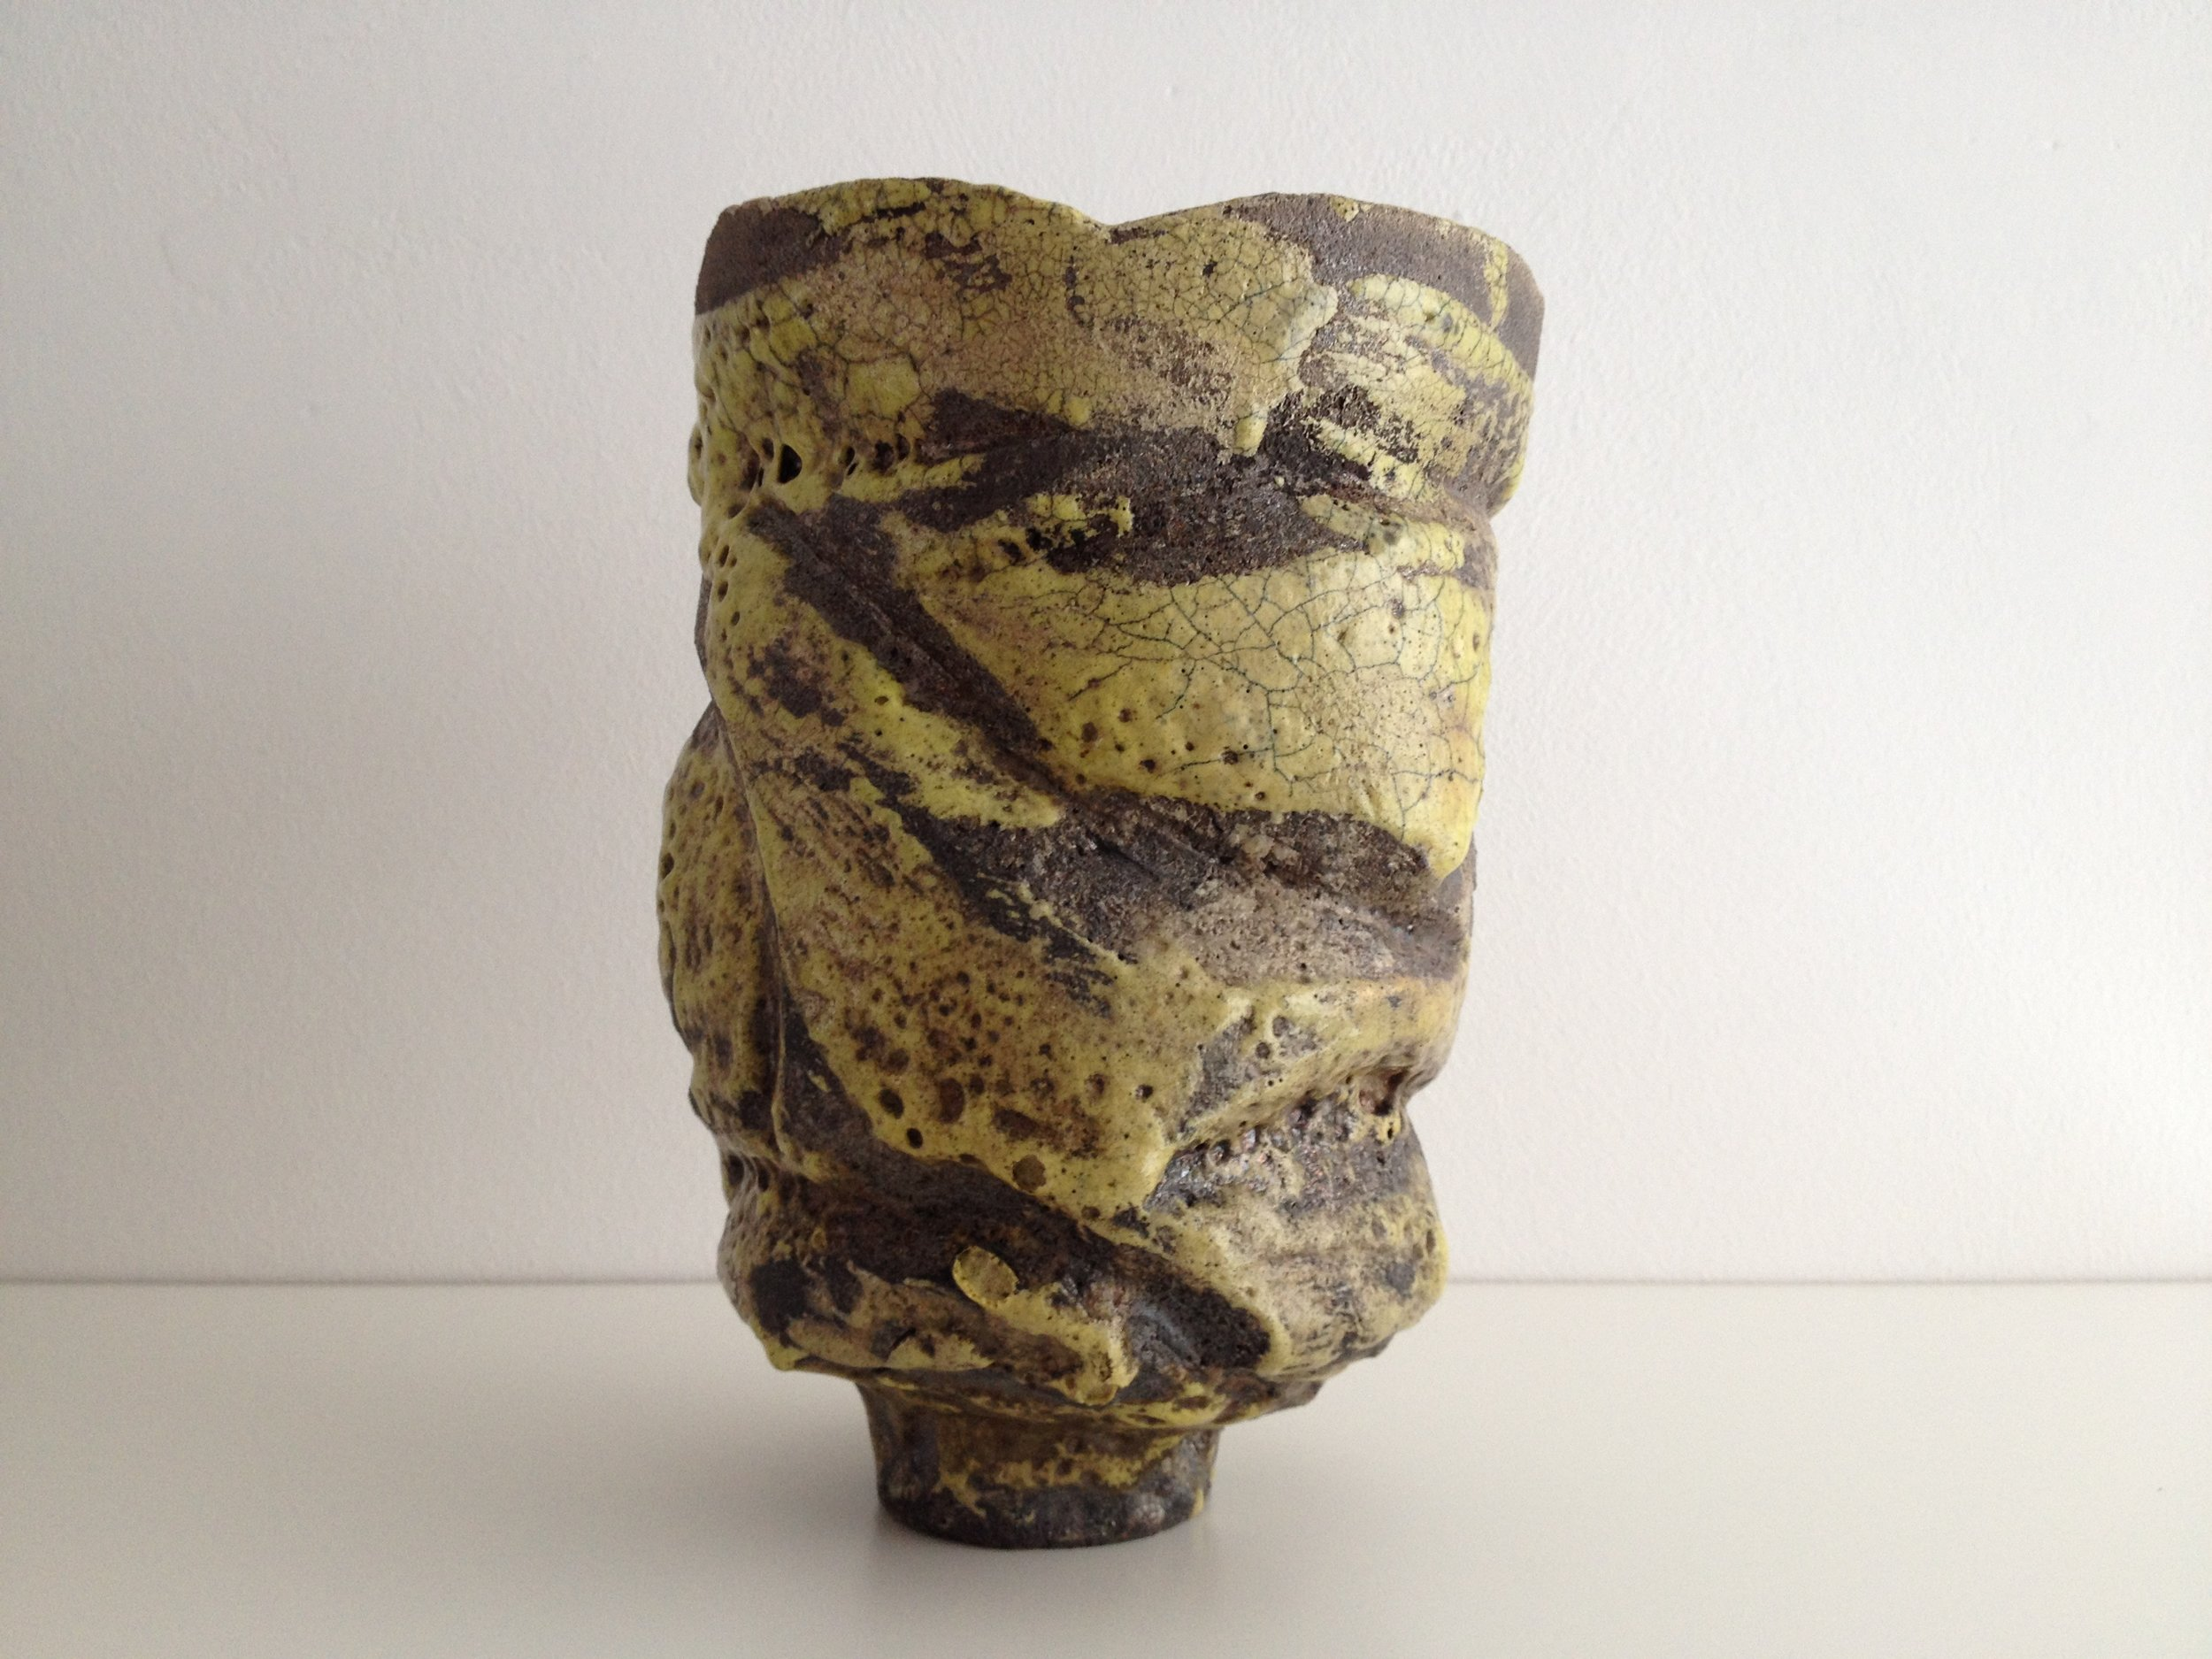 Dante Elsner  Untitled, c 1980  19 cm high x 13 cm diameter  Raku